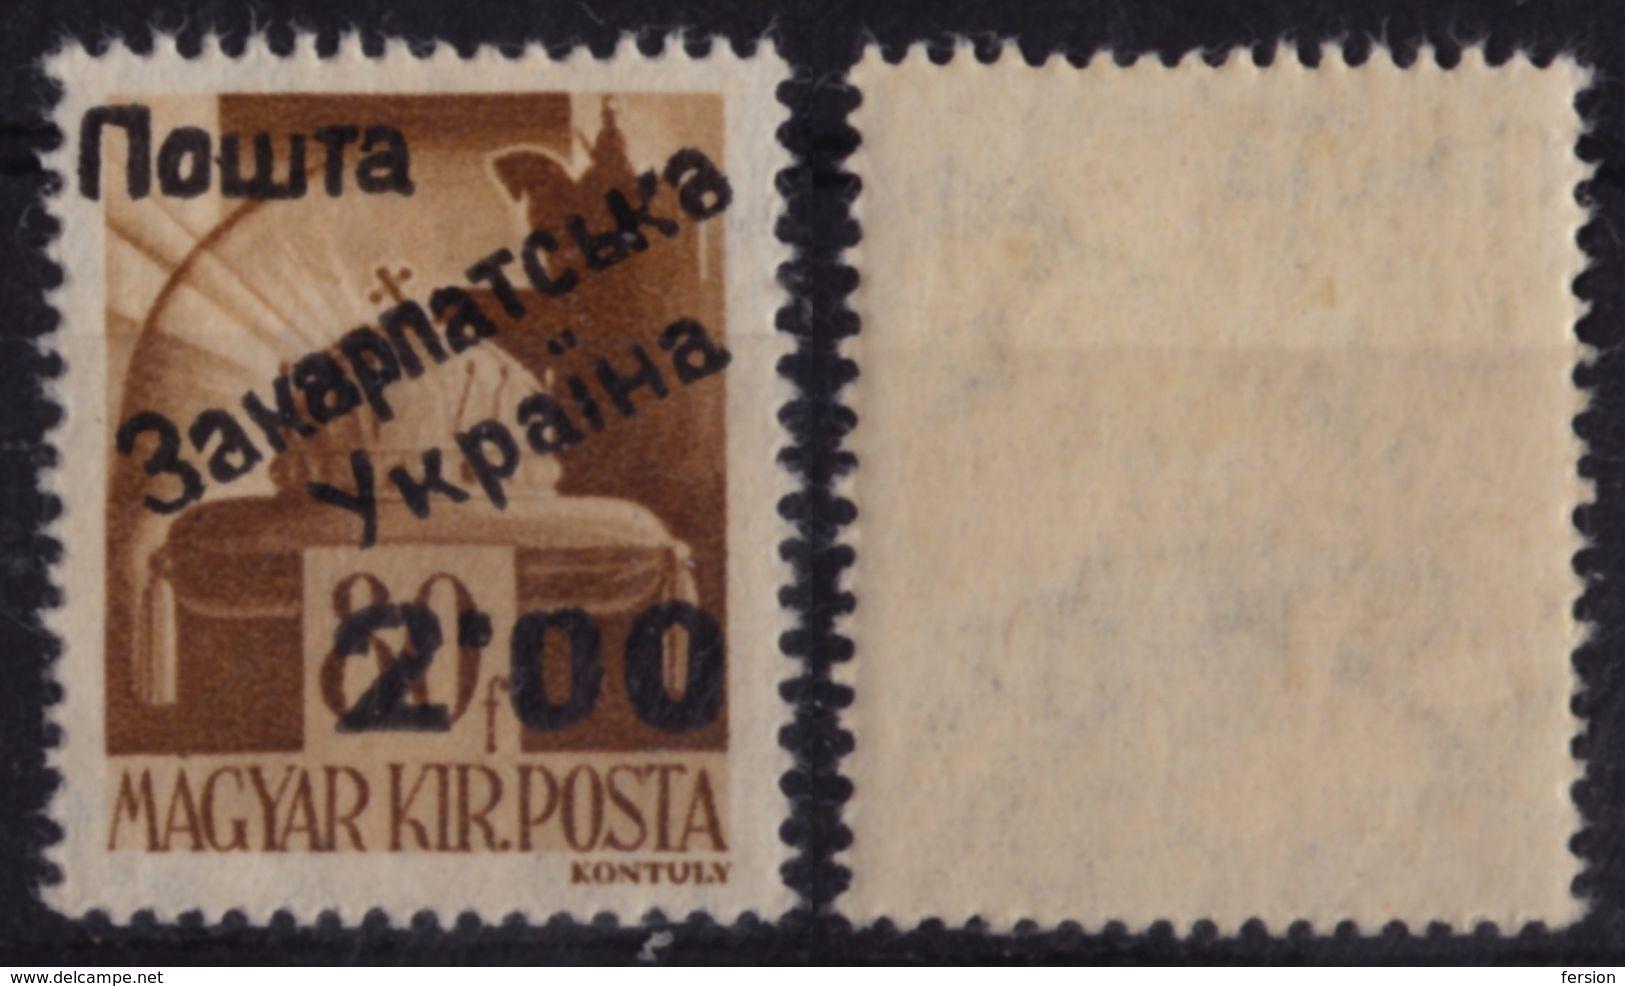 1945 CCCP Occupation - Hungary - Zakarpatska Ukraine Ungvar Uzhhorod - Holy Crown Overprint - Ukraine